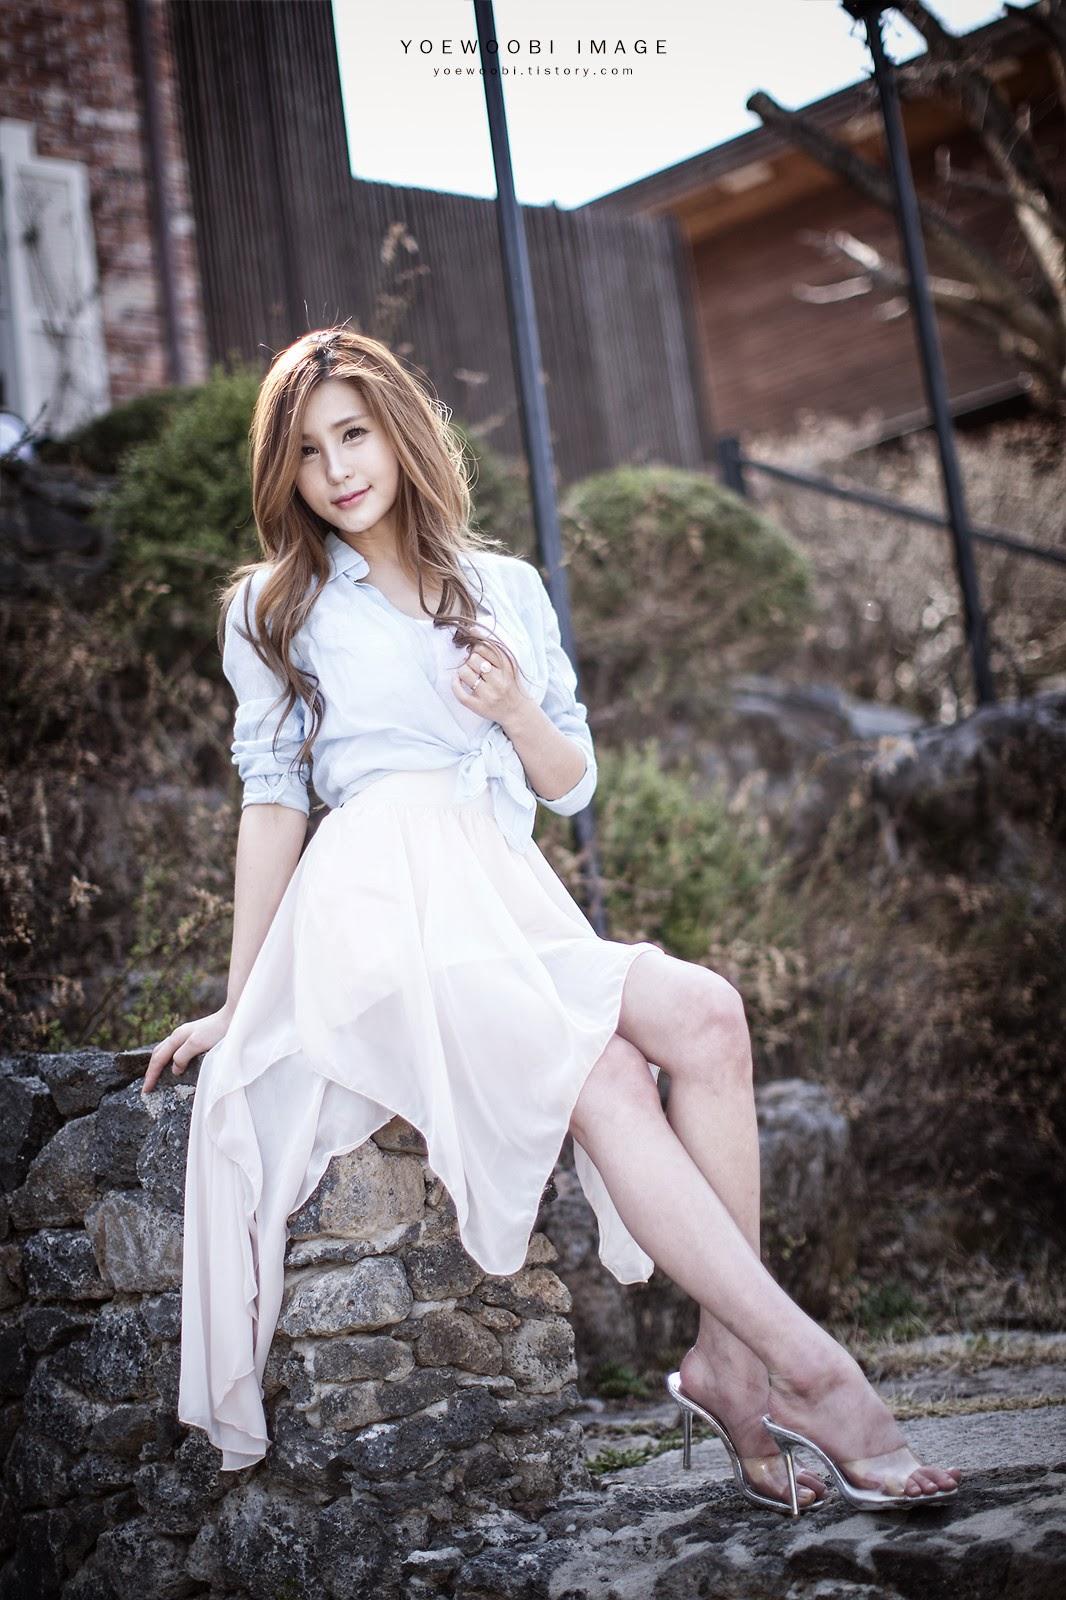 2 Lovely Soo Yu - very cute asian girl-girlcute4u.blogspot.com